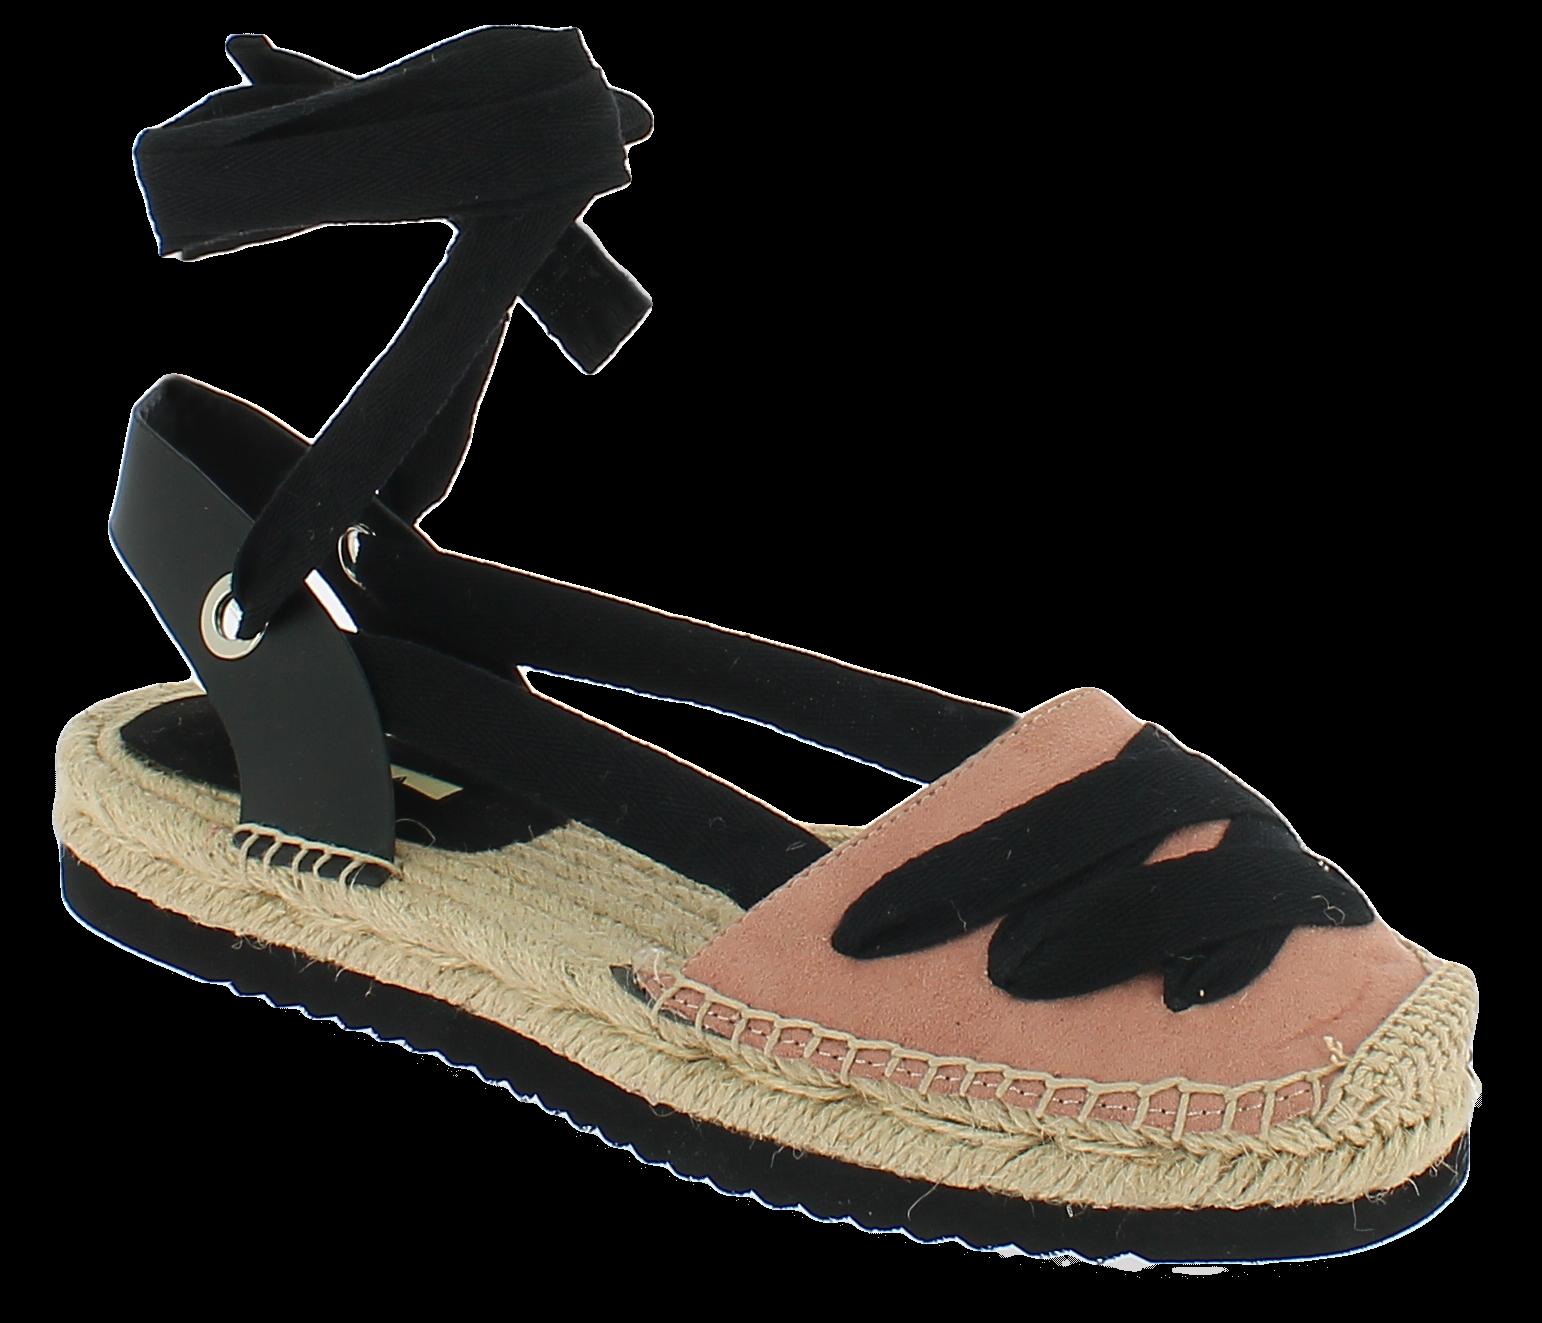 CORINA Γυναικεία Σανδάλια C8255 Ροζ - IqShoes - C8255 ROSA-CORINA-pink-41/1/11/2 παπούτσια  new in